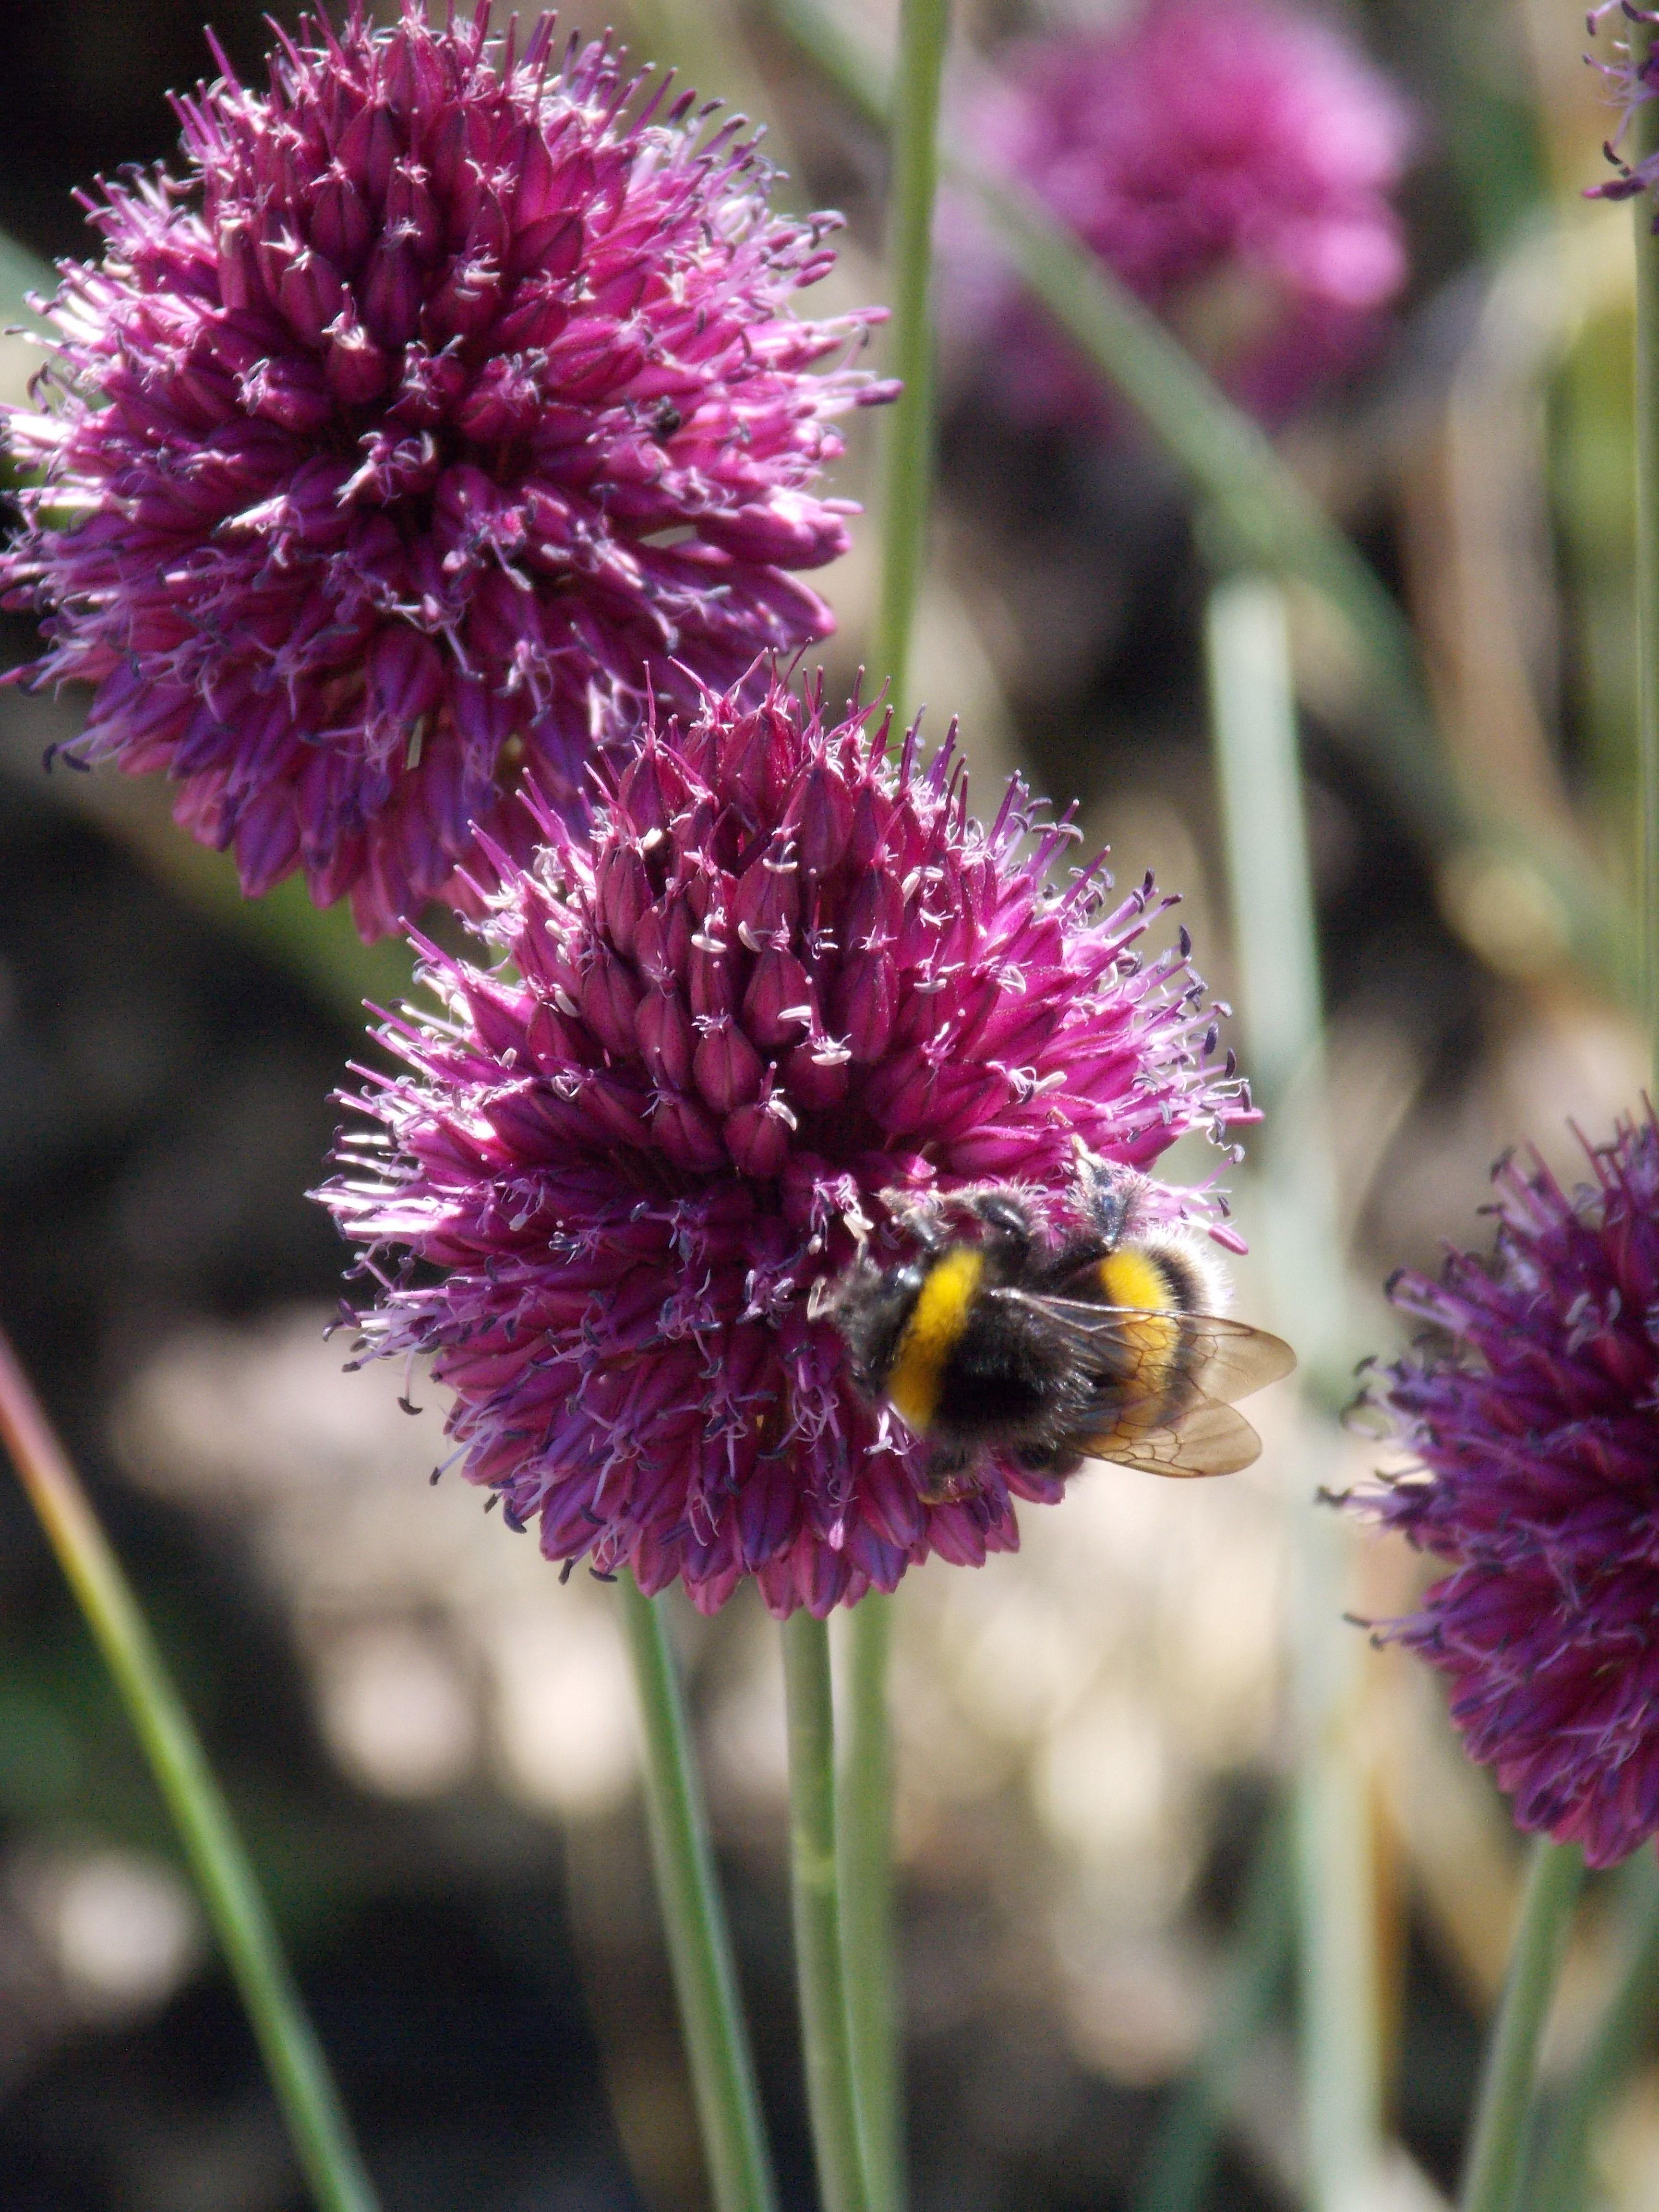 Bees gathering pollen. Hommels